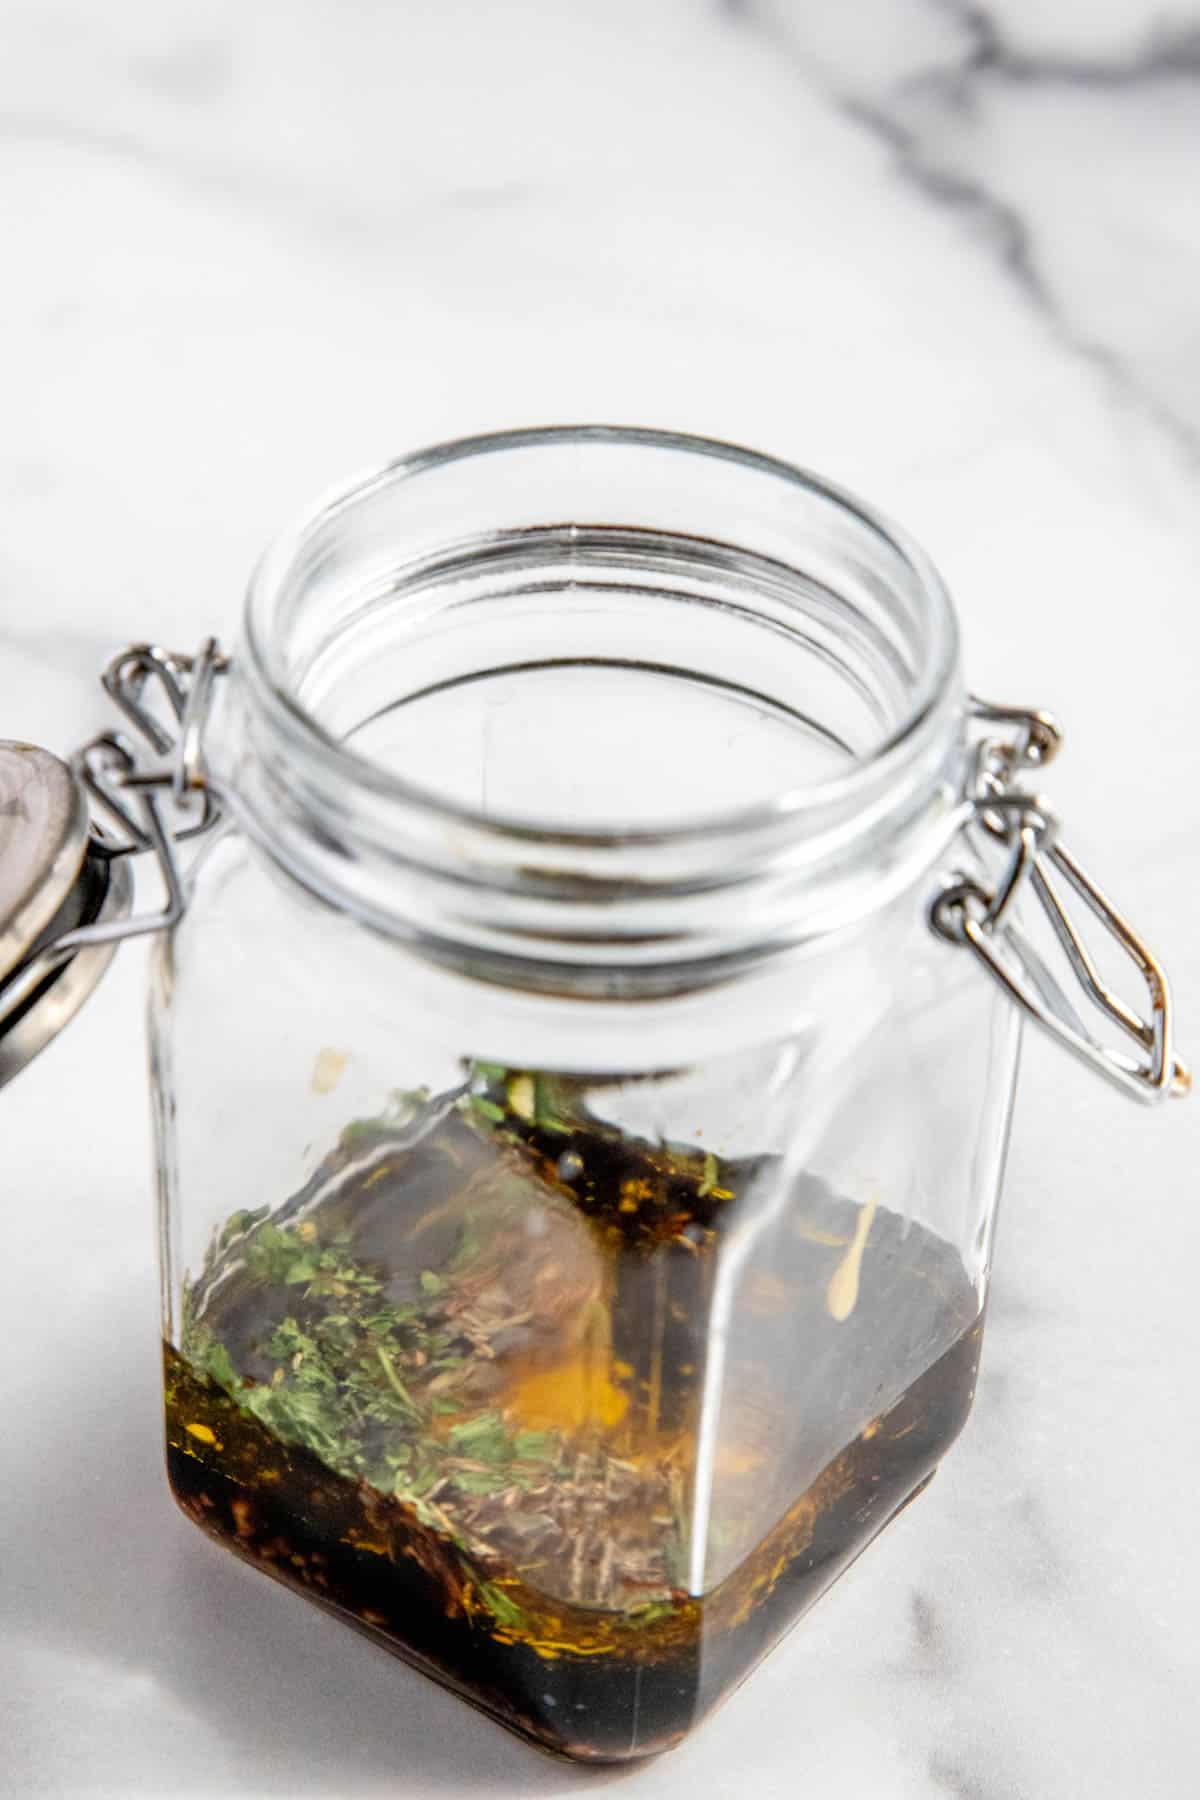 mustard vinaigrette ingredients in a glass jar before shaking